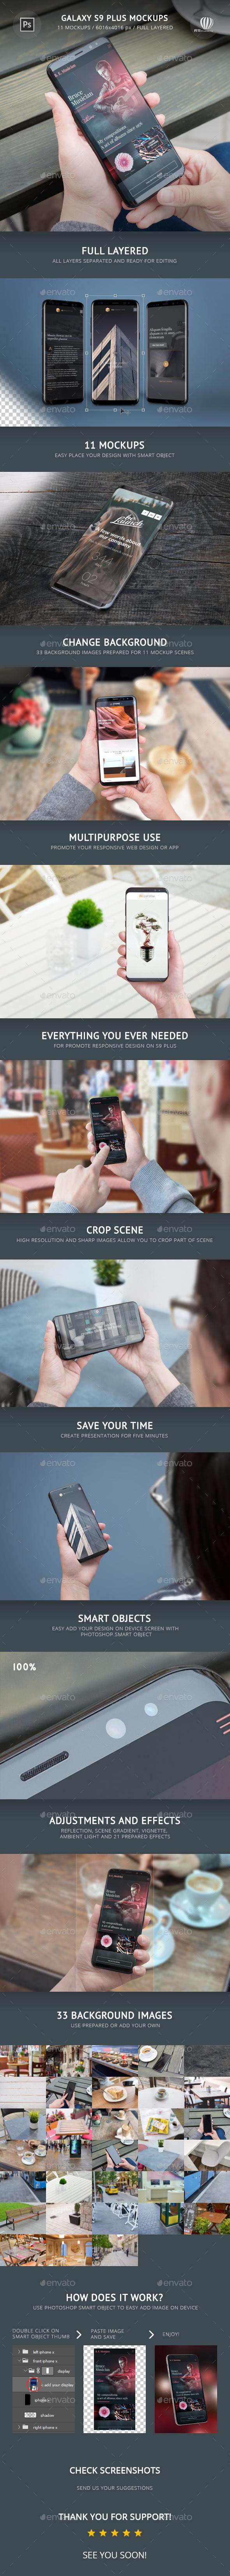 Galaxy S9 Plus Mockups - Mobile Displays